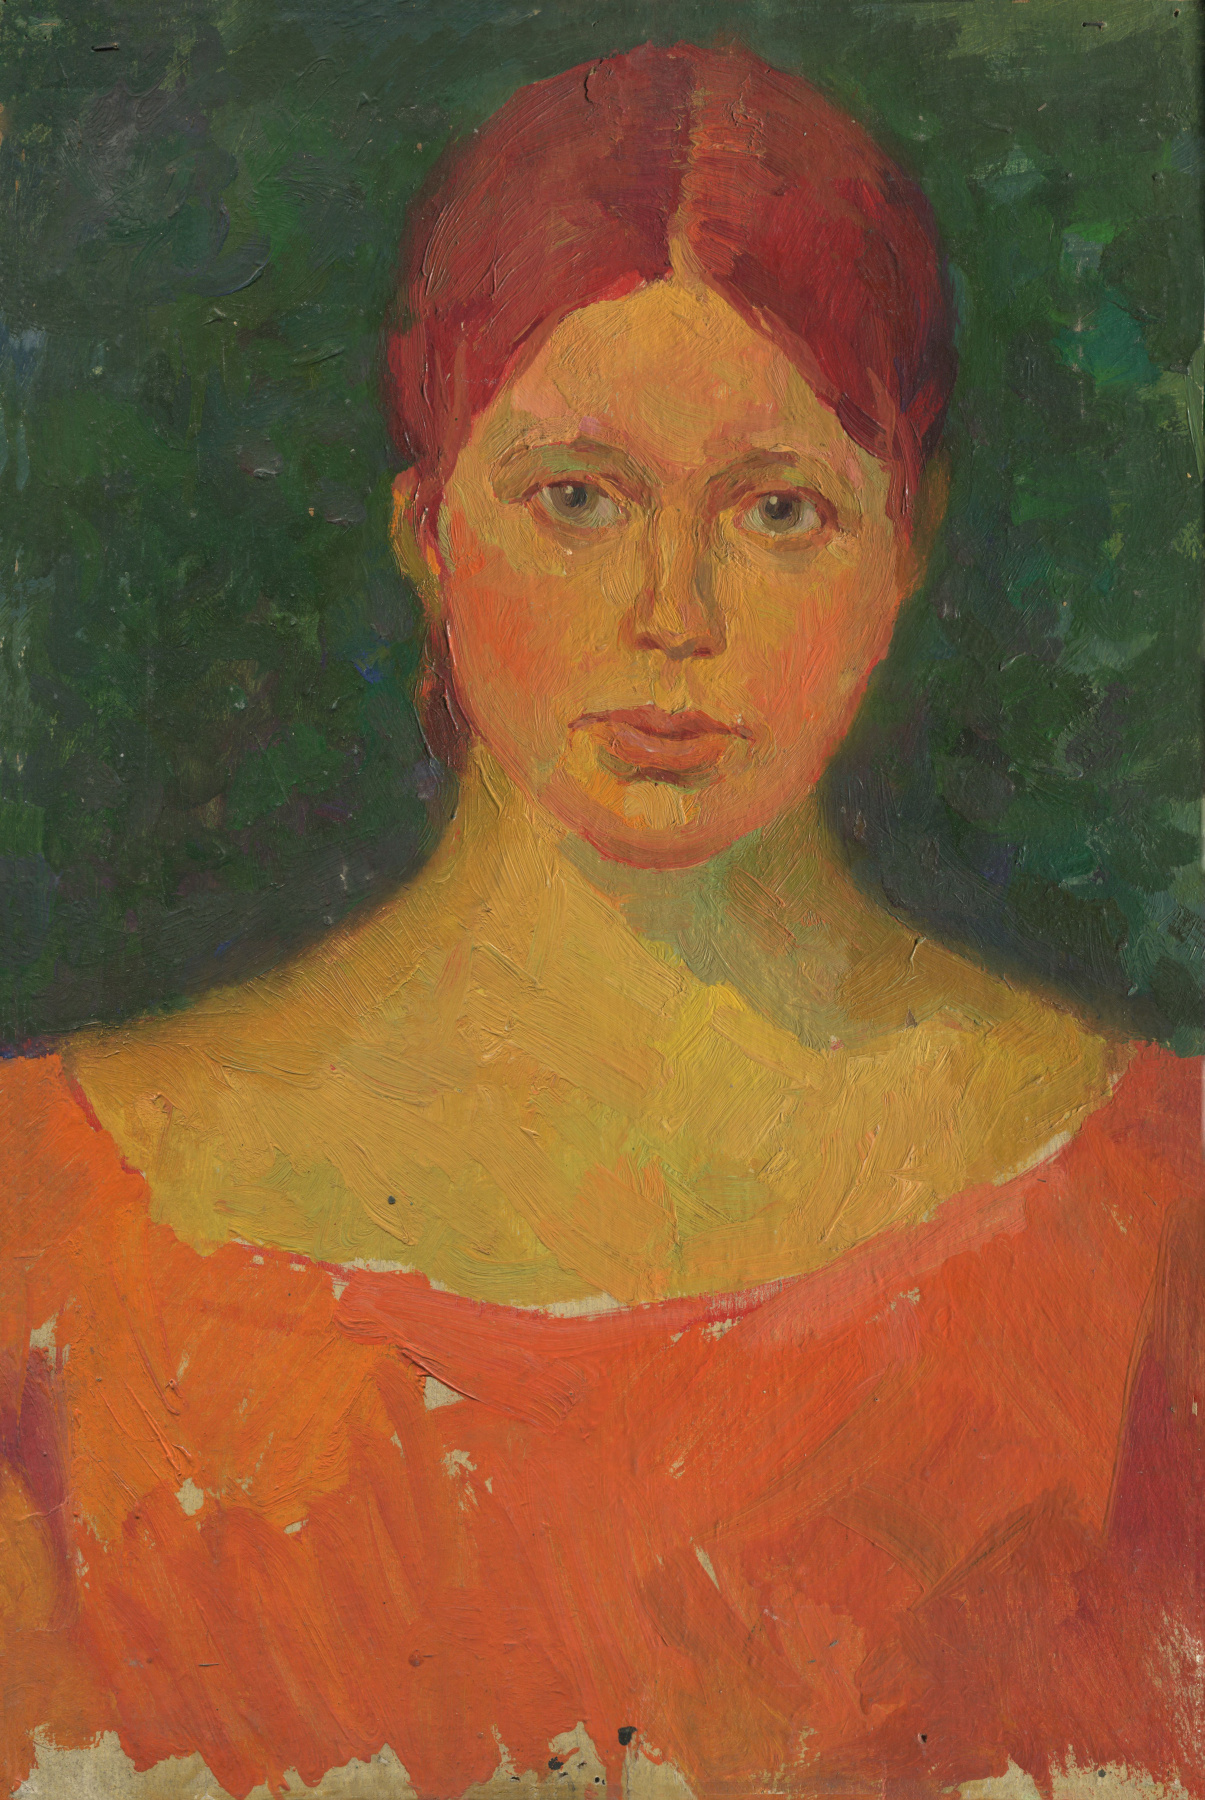 Alexandrovich Rudolf Pavlov. Portrait of a woman in an orange dress.